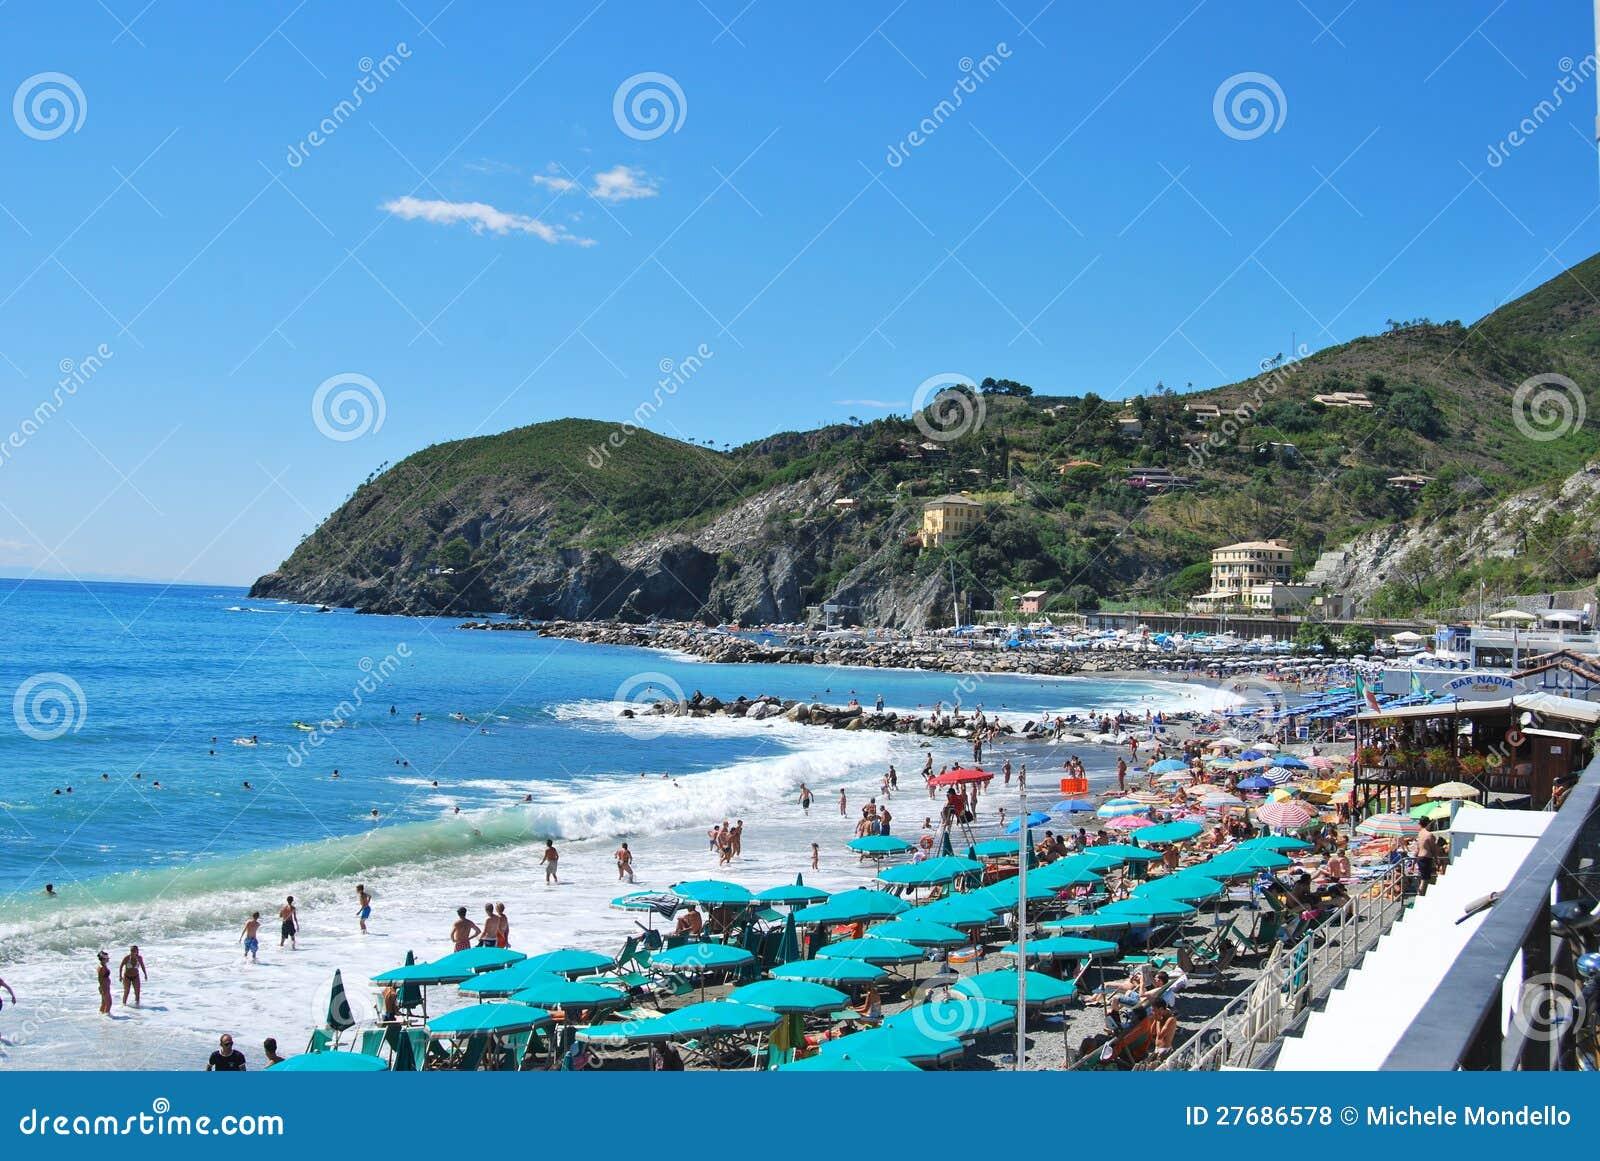 Plage de levanto l 39 italie photo stock ditorial image du italie ville 27686578 - Levanto italie office du tourisme ...